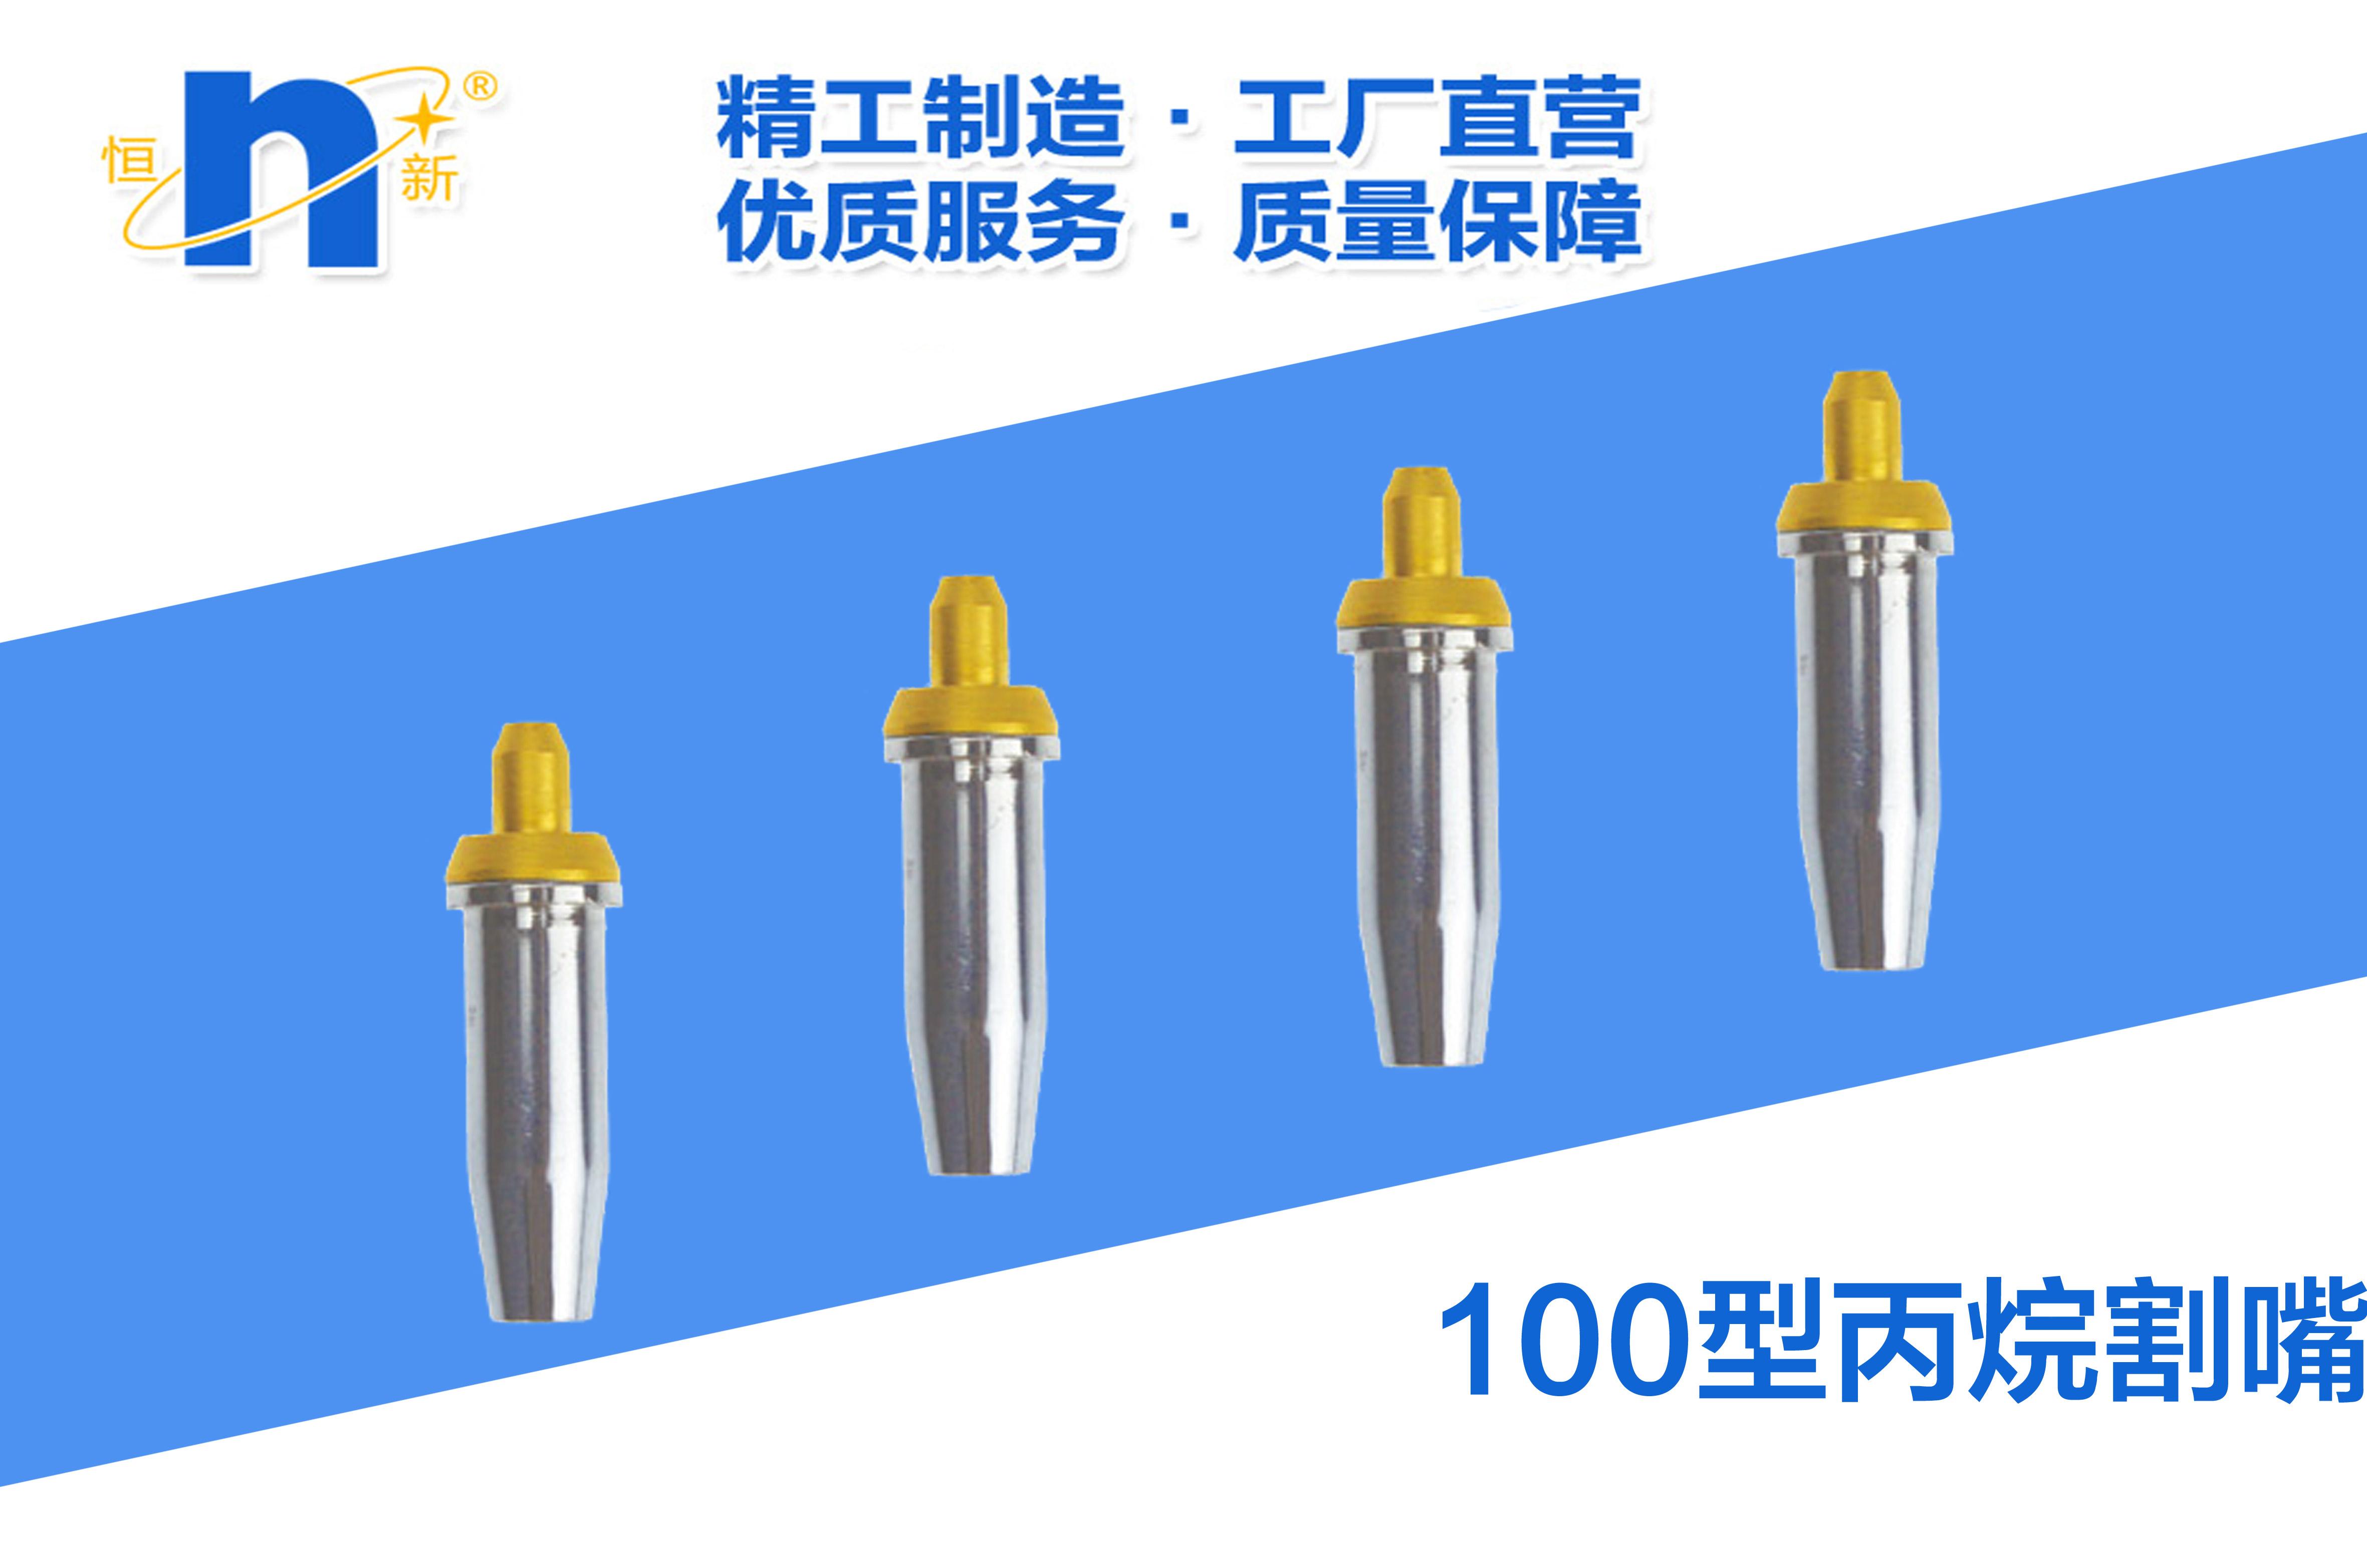 G07-100型丙烷割嘴  恒新